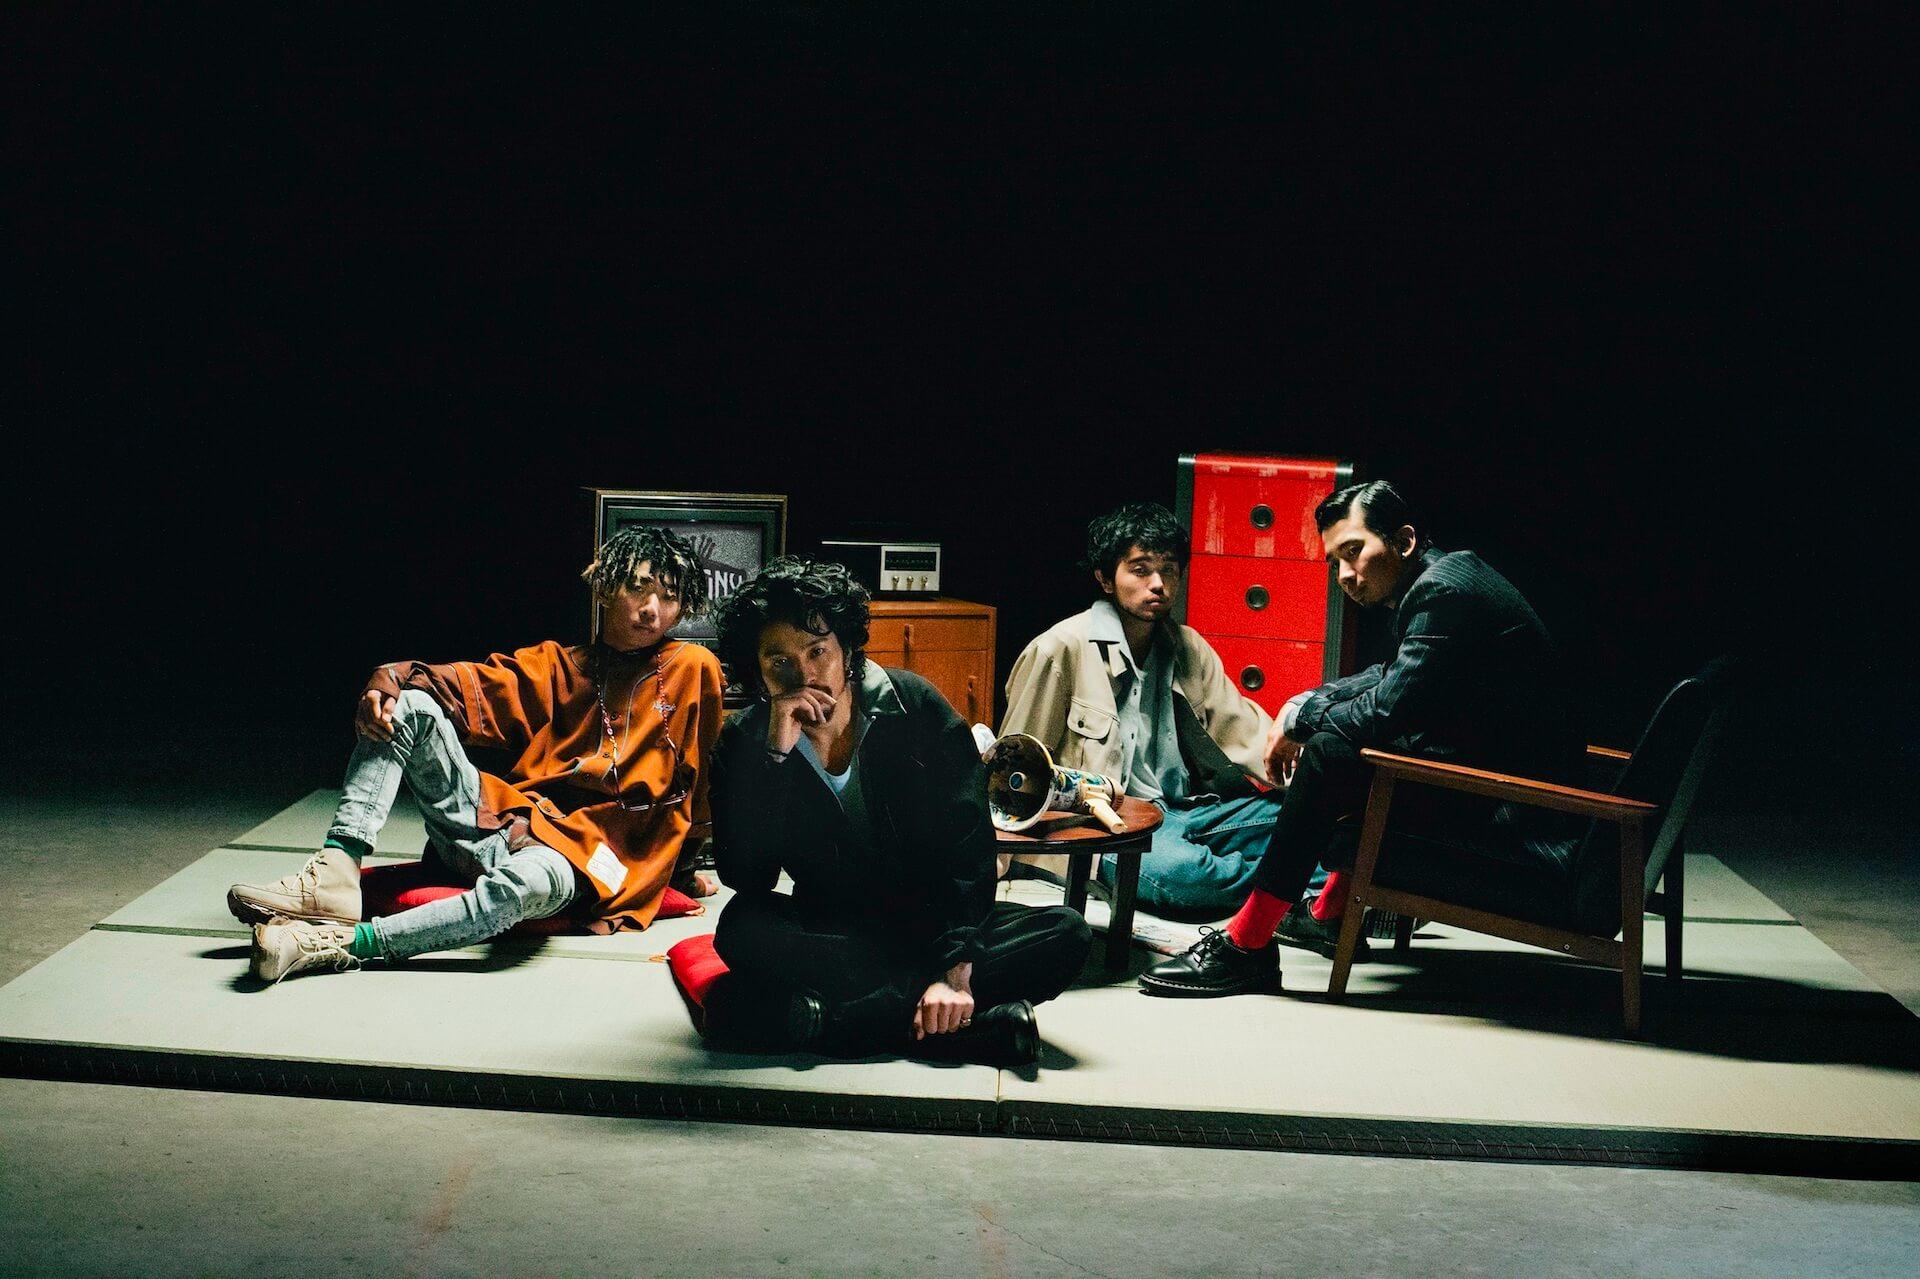 King Gnuニューアルバム『CEREMONY』収録の新曲「小さな惑星」がHONDA VEZEL 新CMに抜擢! music191127_kinggnu_2